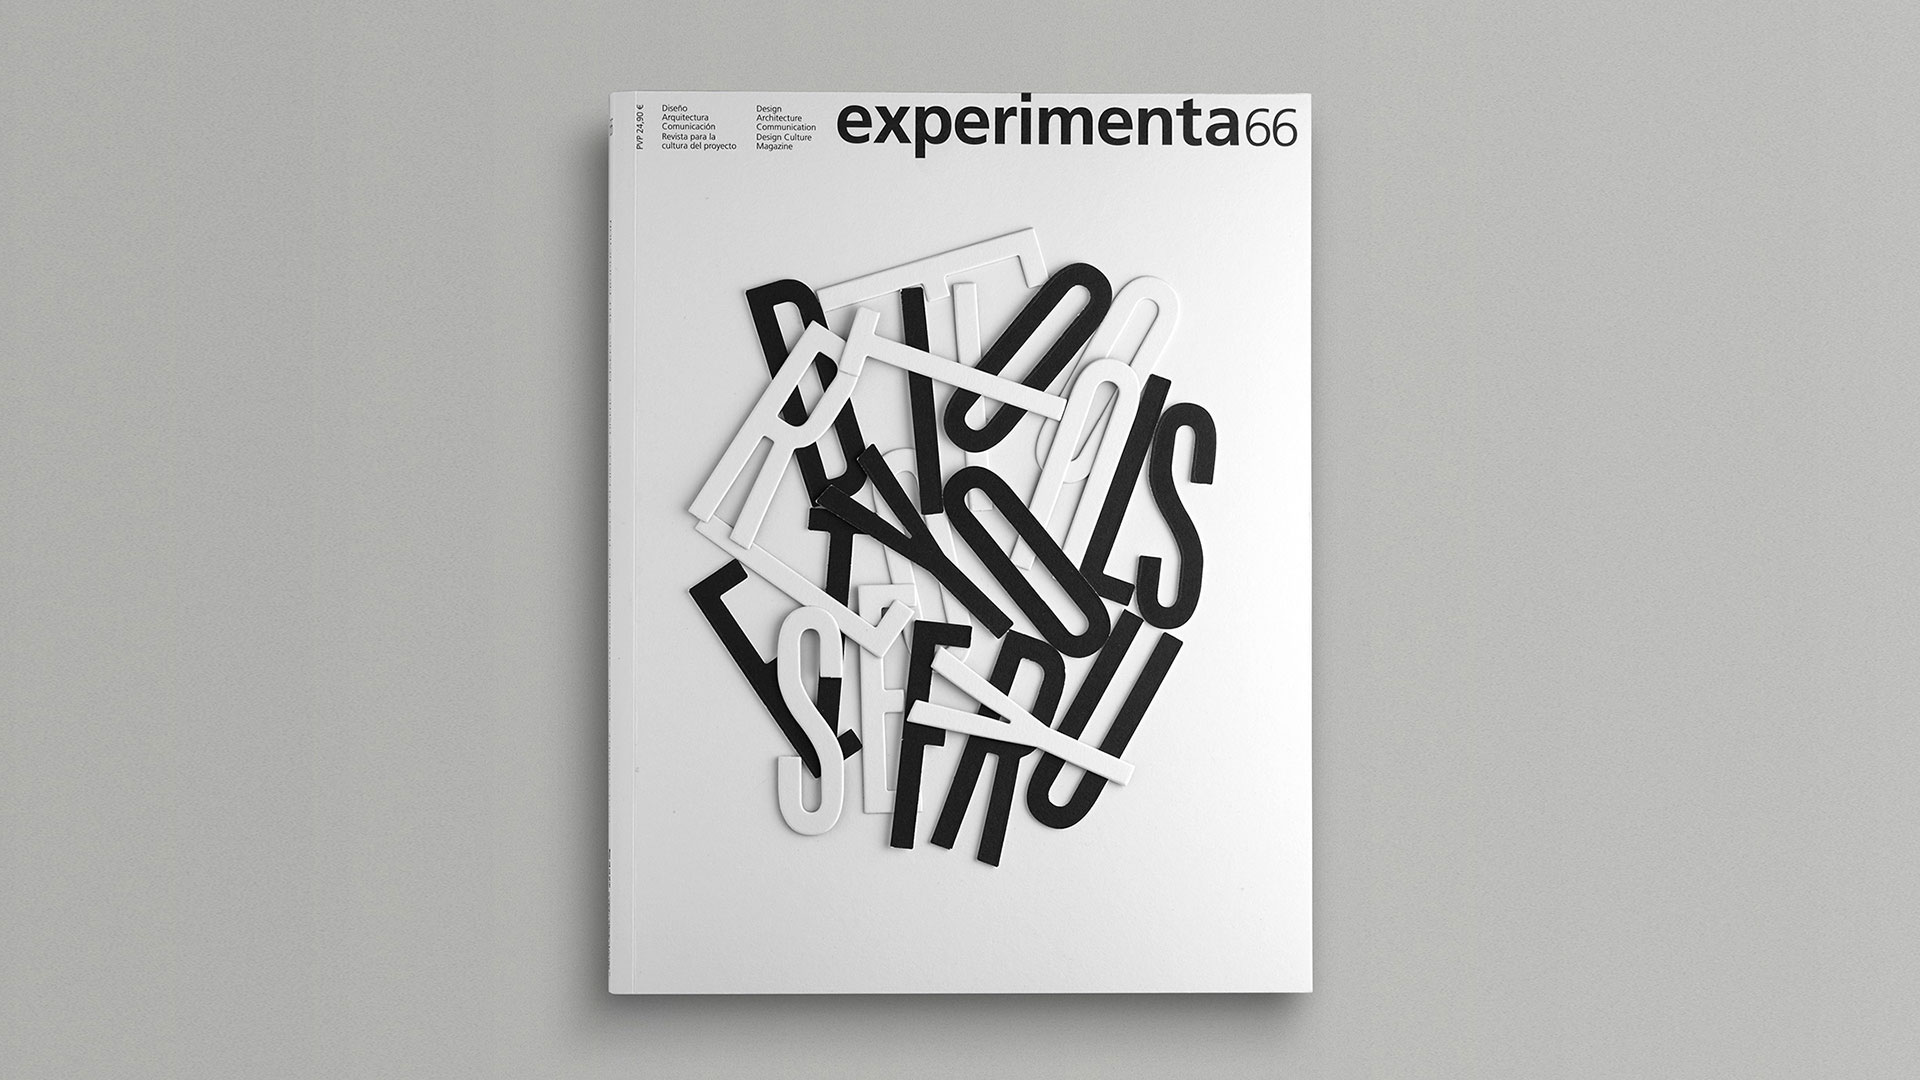 Experimenta 66 magazine cover by Lavernia & Cienfuegos - PaperSpecs